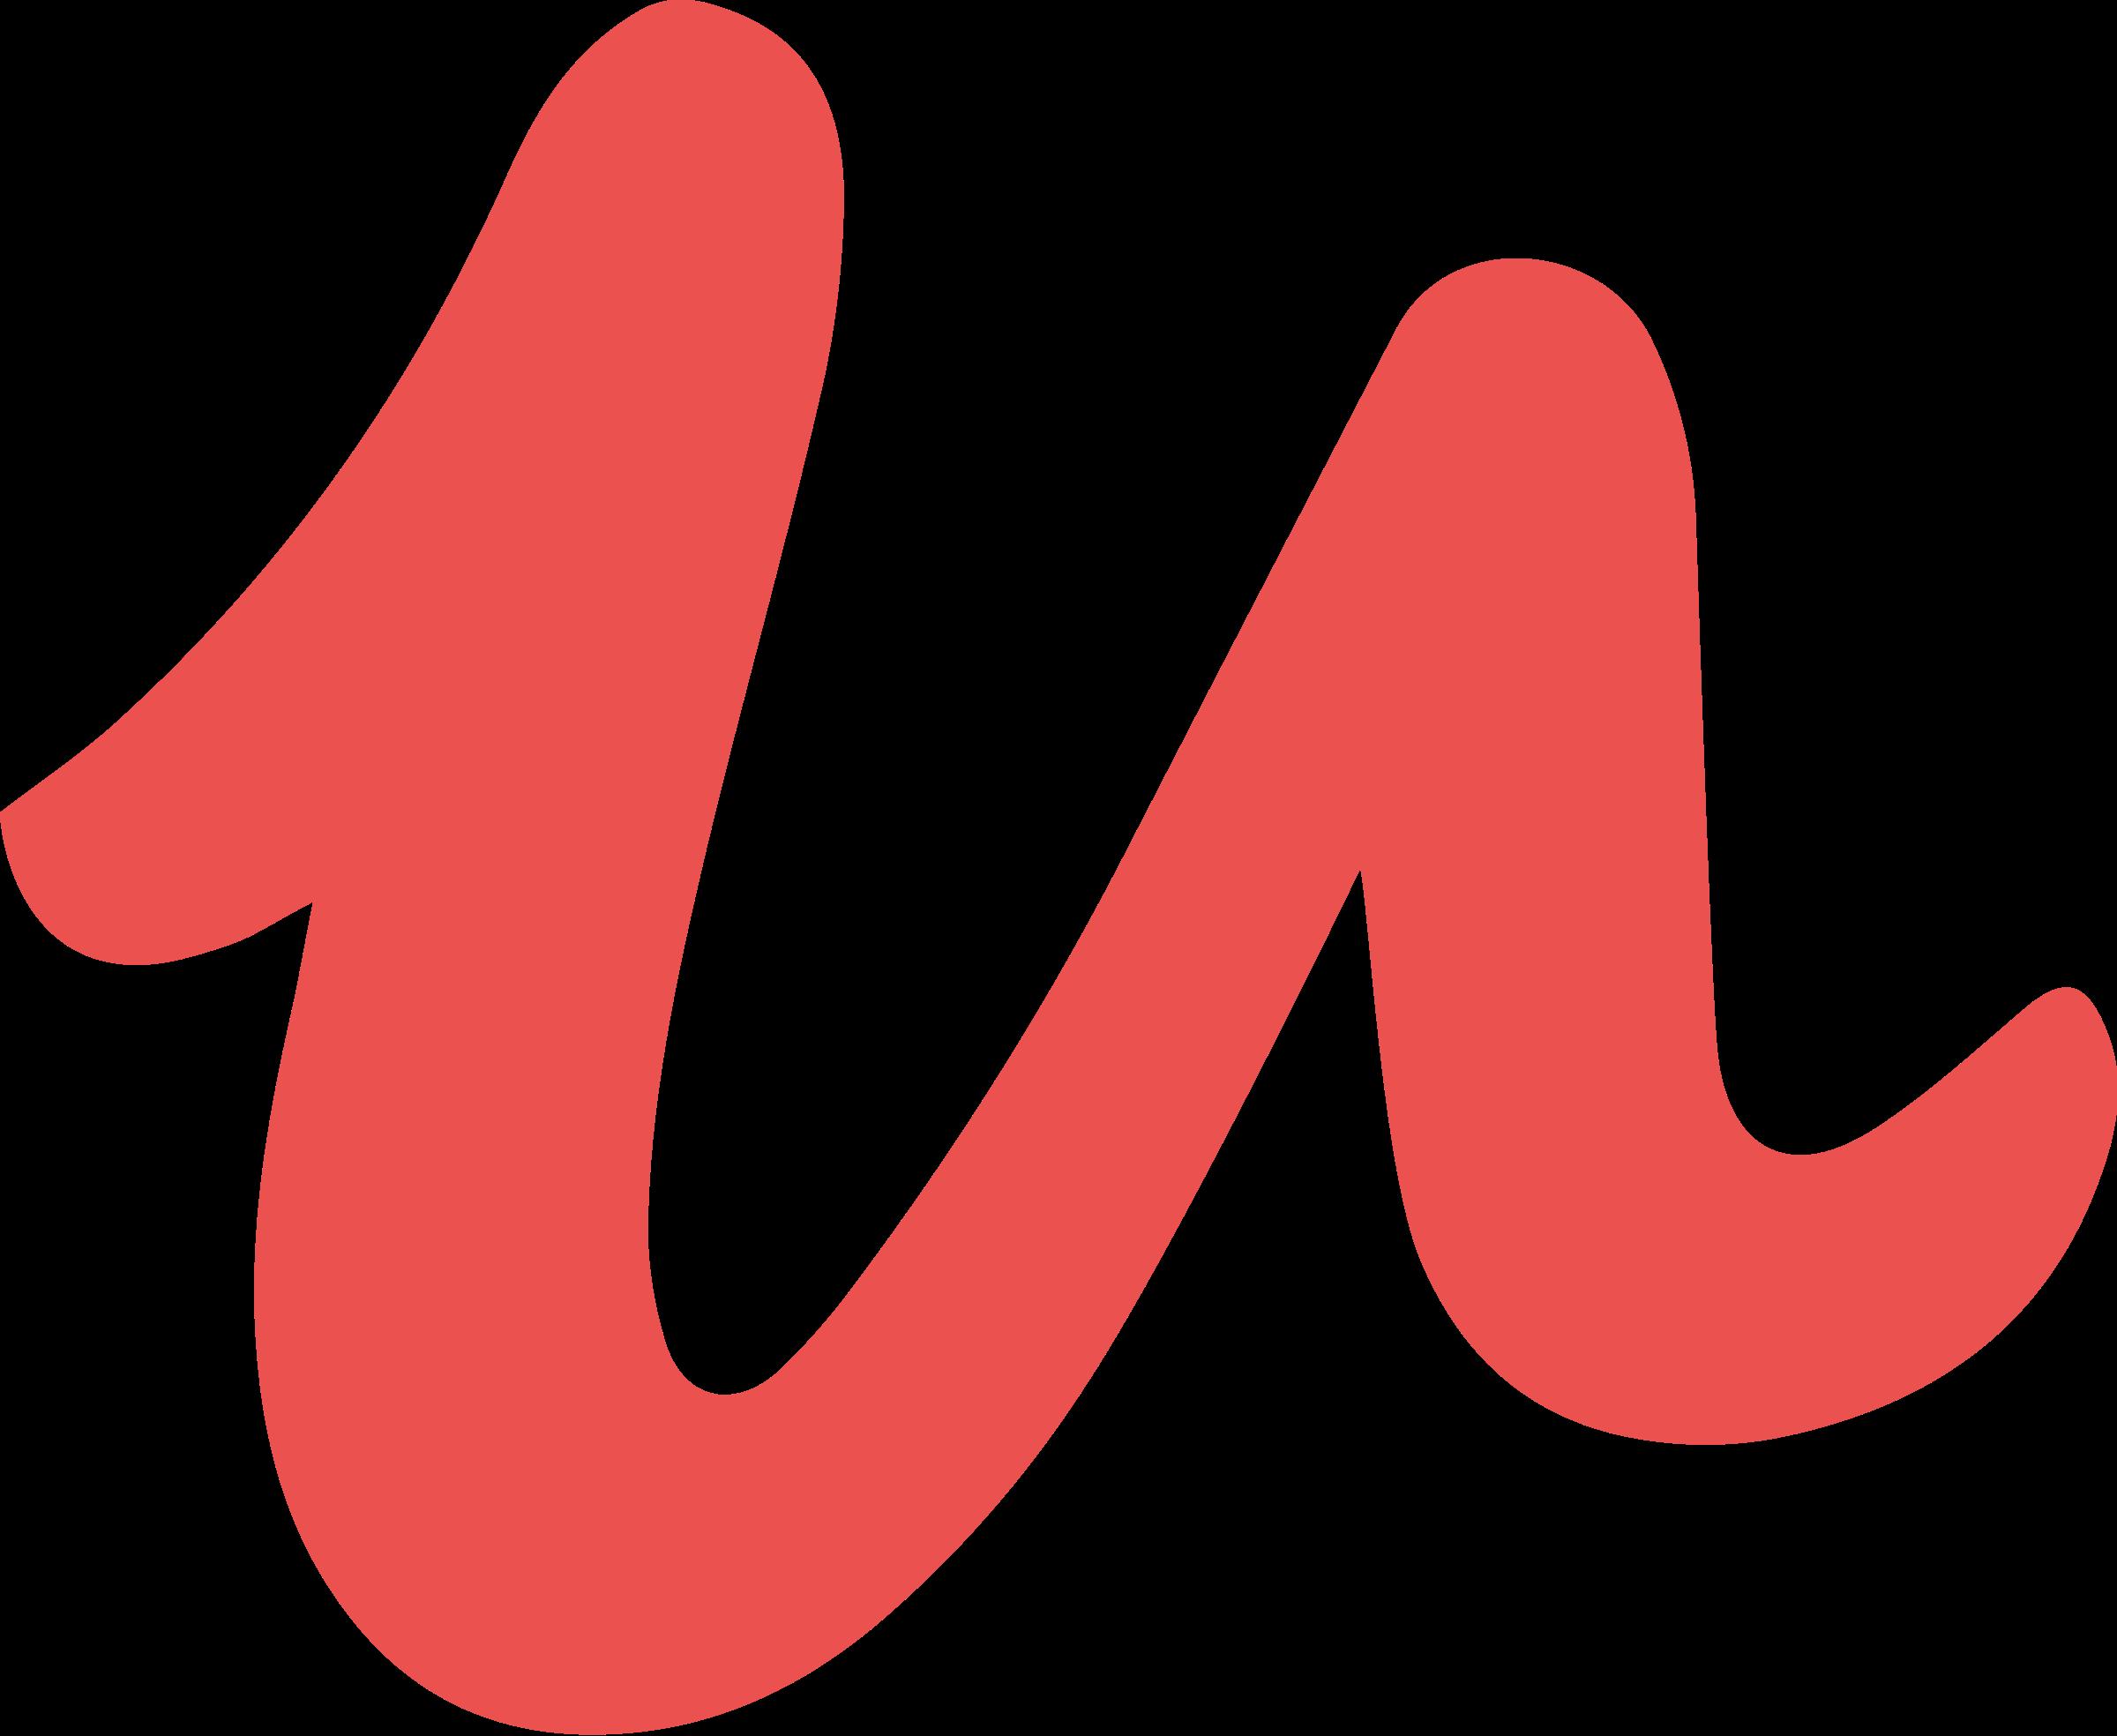 Udemy - Logos Download